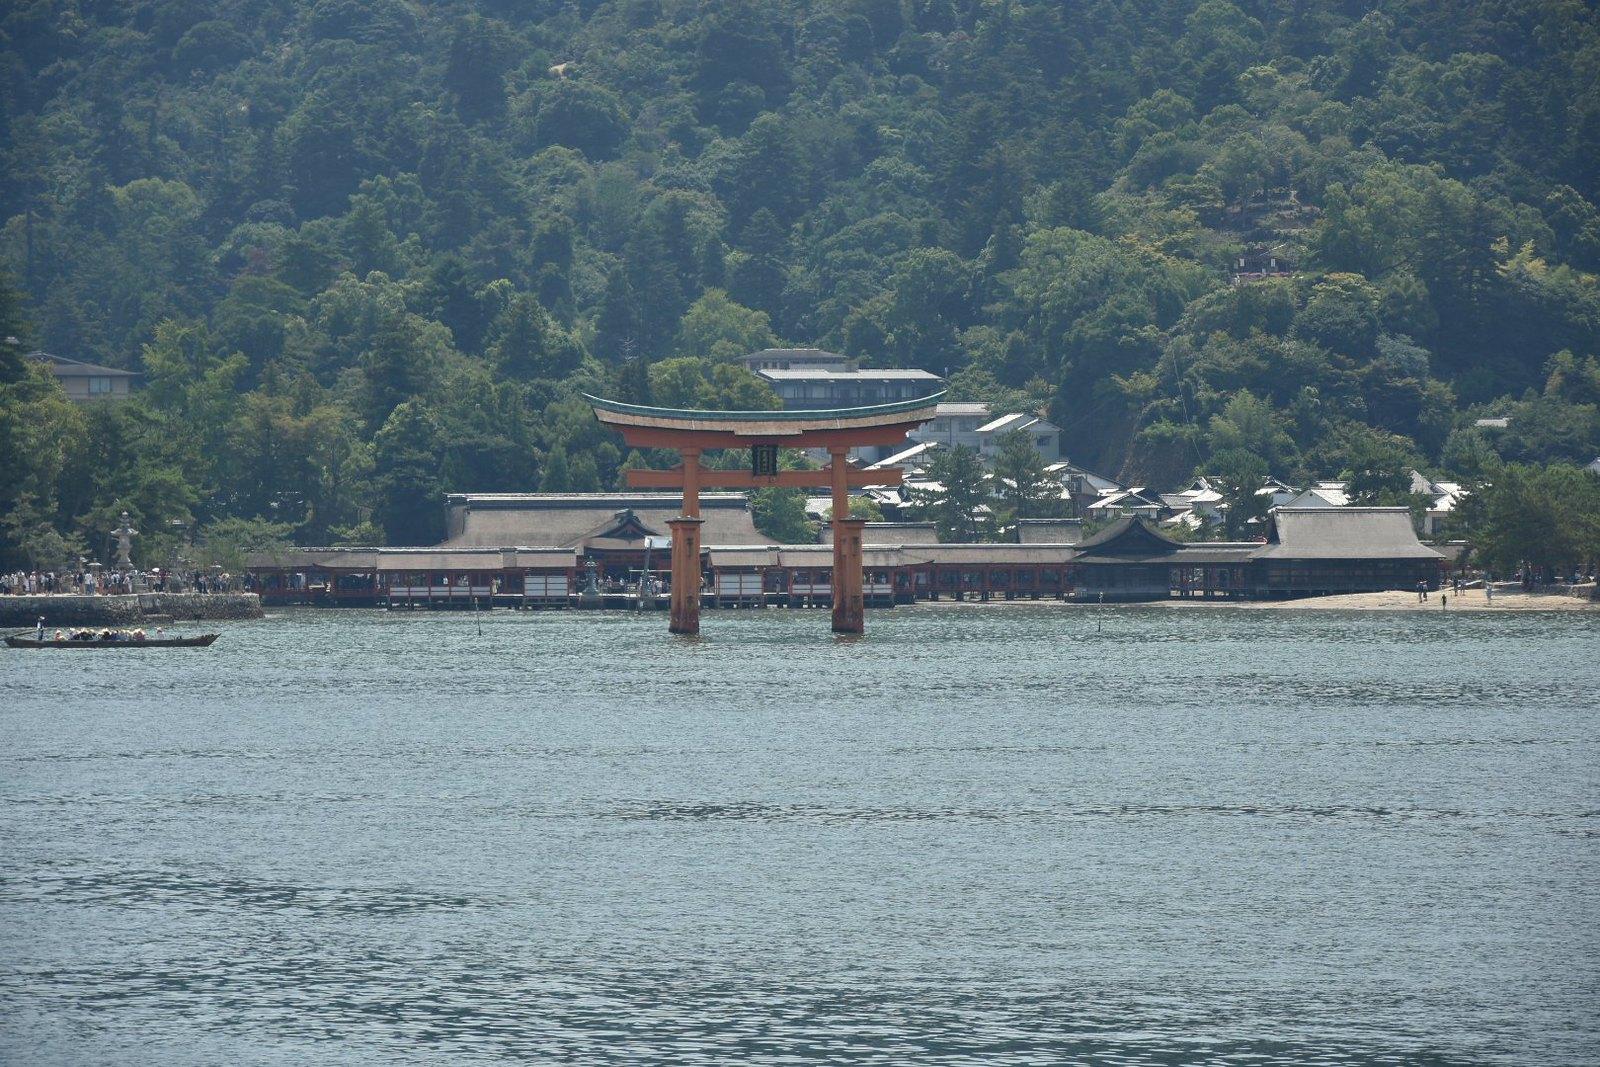 Miyajima - le torii et le sanctuaire d'Itsukushima-jinja